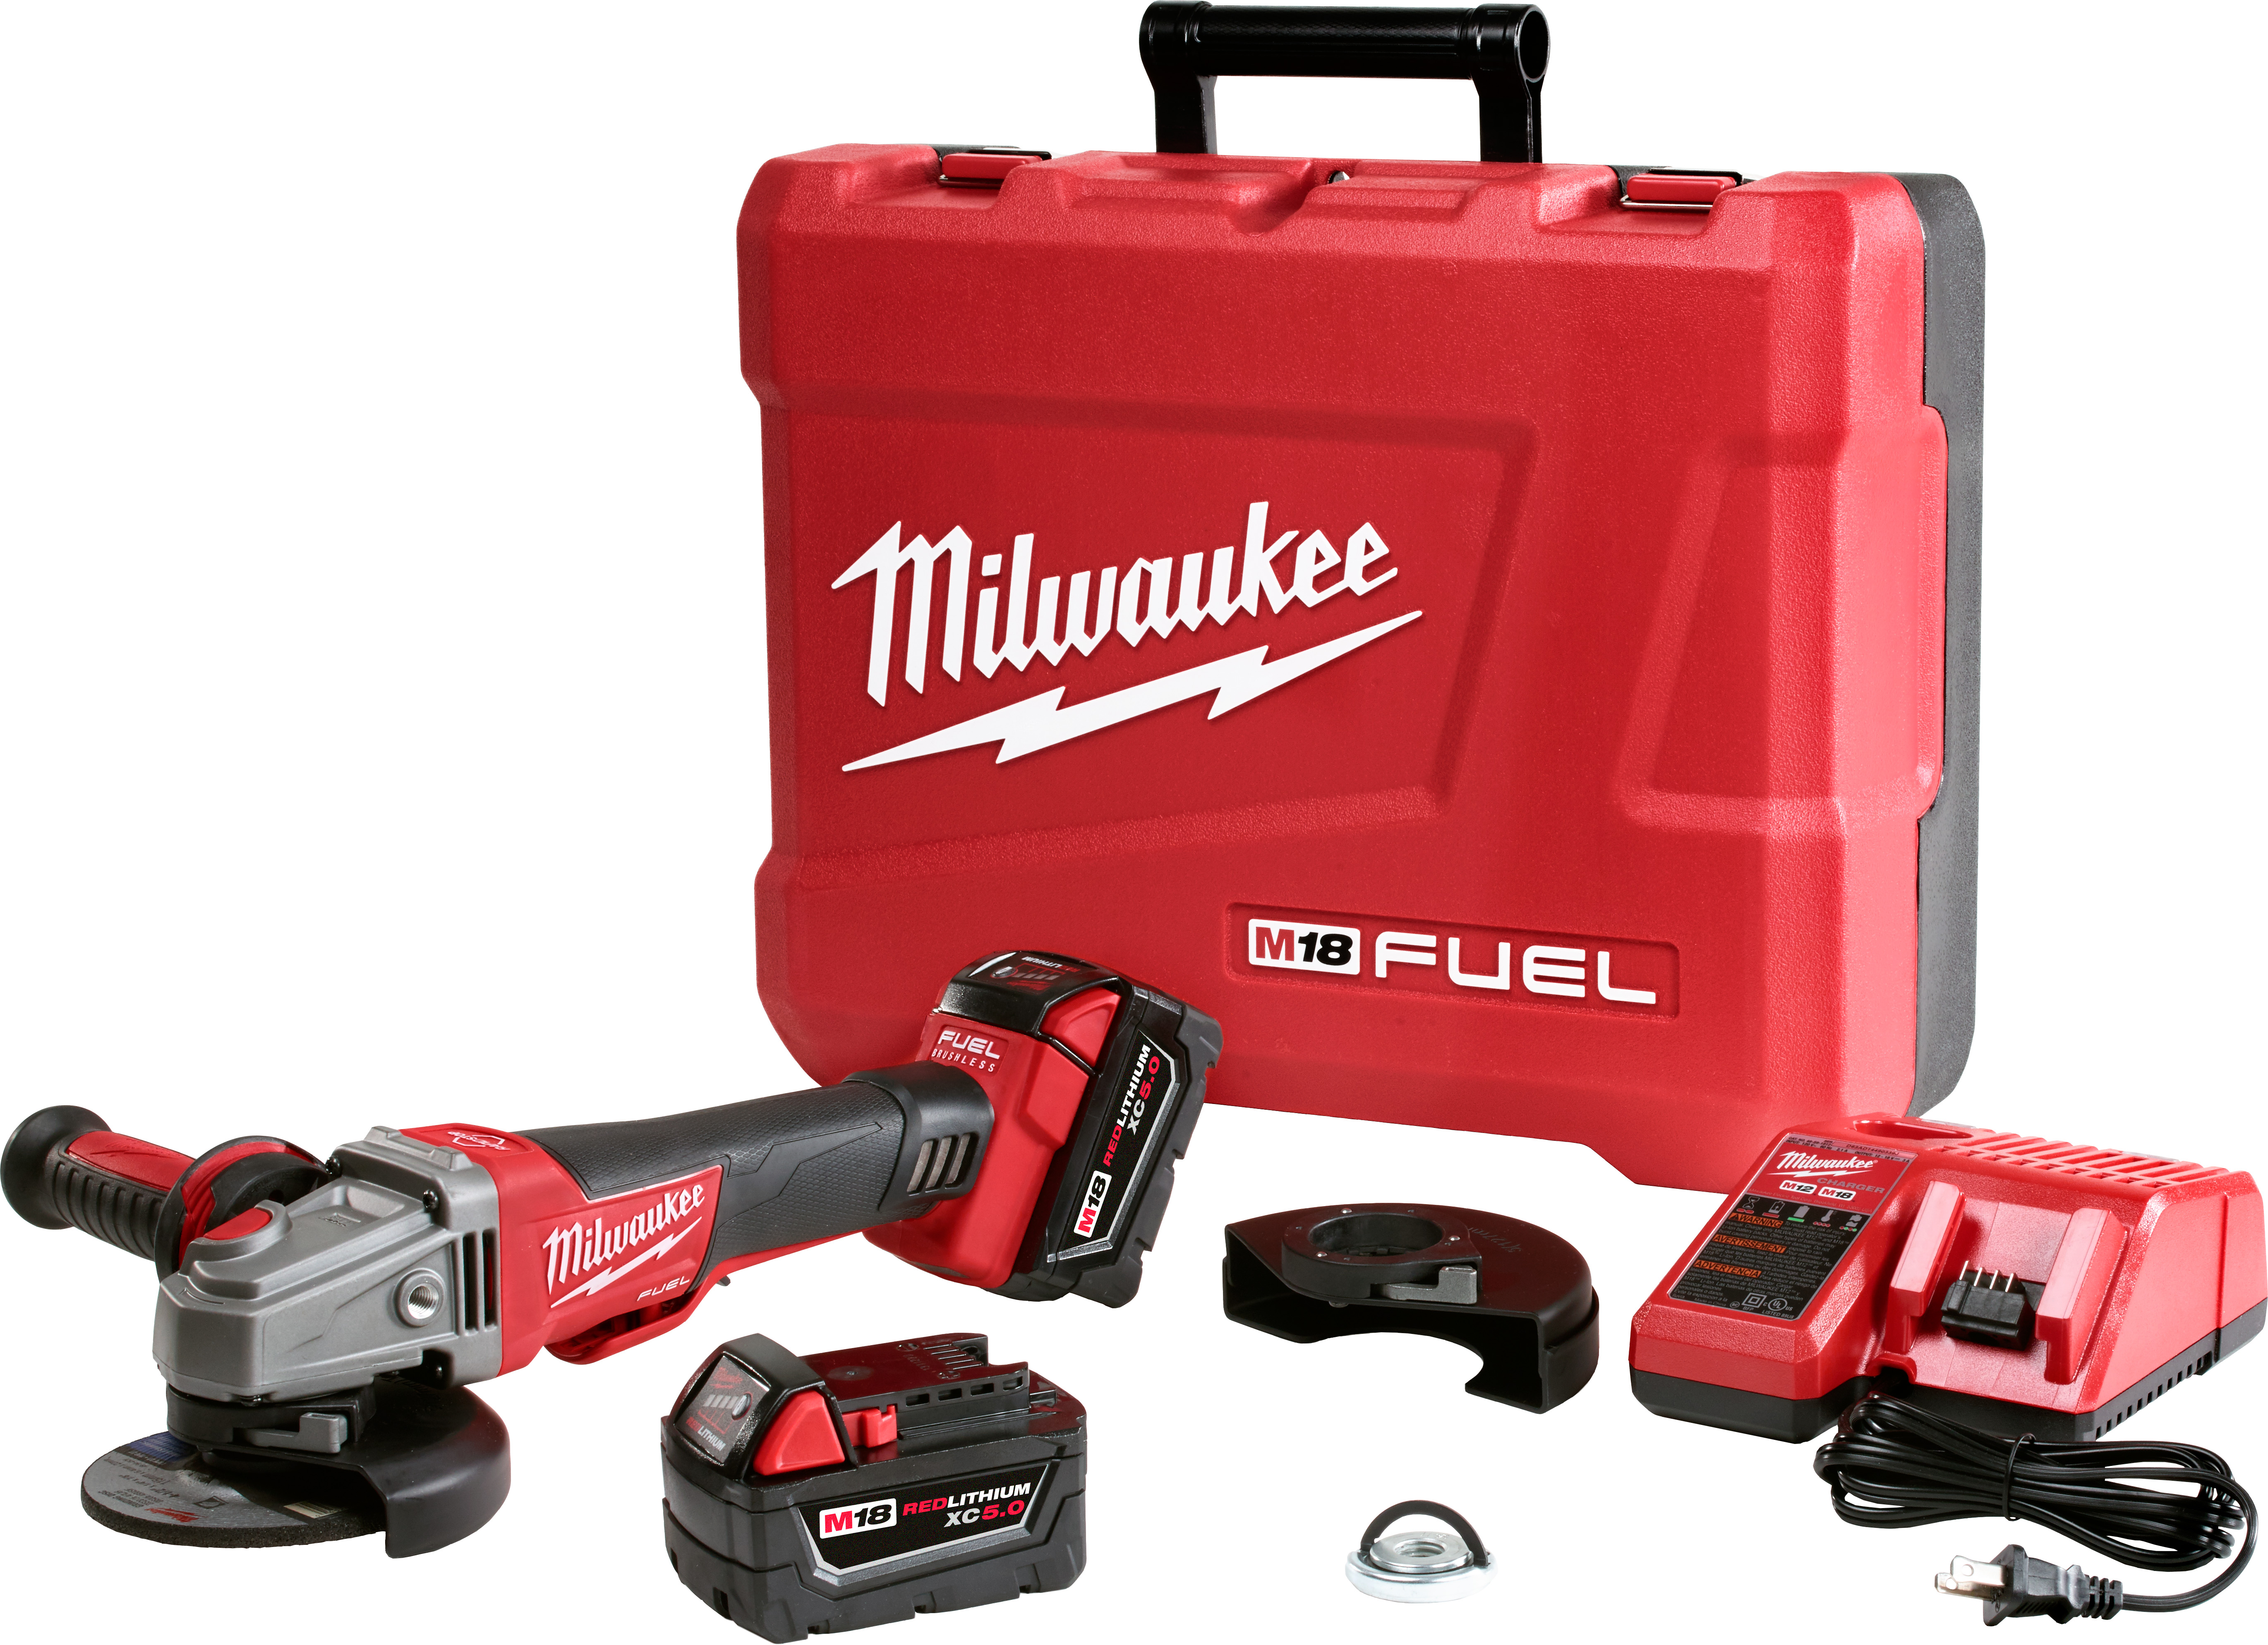 Milwaukee® M18™ FUEL™ 2783-22 Cordless Angle Braking Grinder Kit, 5 in Dia Wheel, 5/8-11 Arbor/Shank, 18 VDC, REDLITHIUM™ Battery, 2 Batteries, Paddle No-Lock Switch